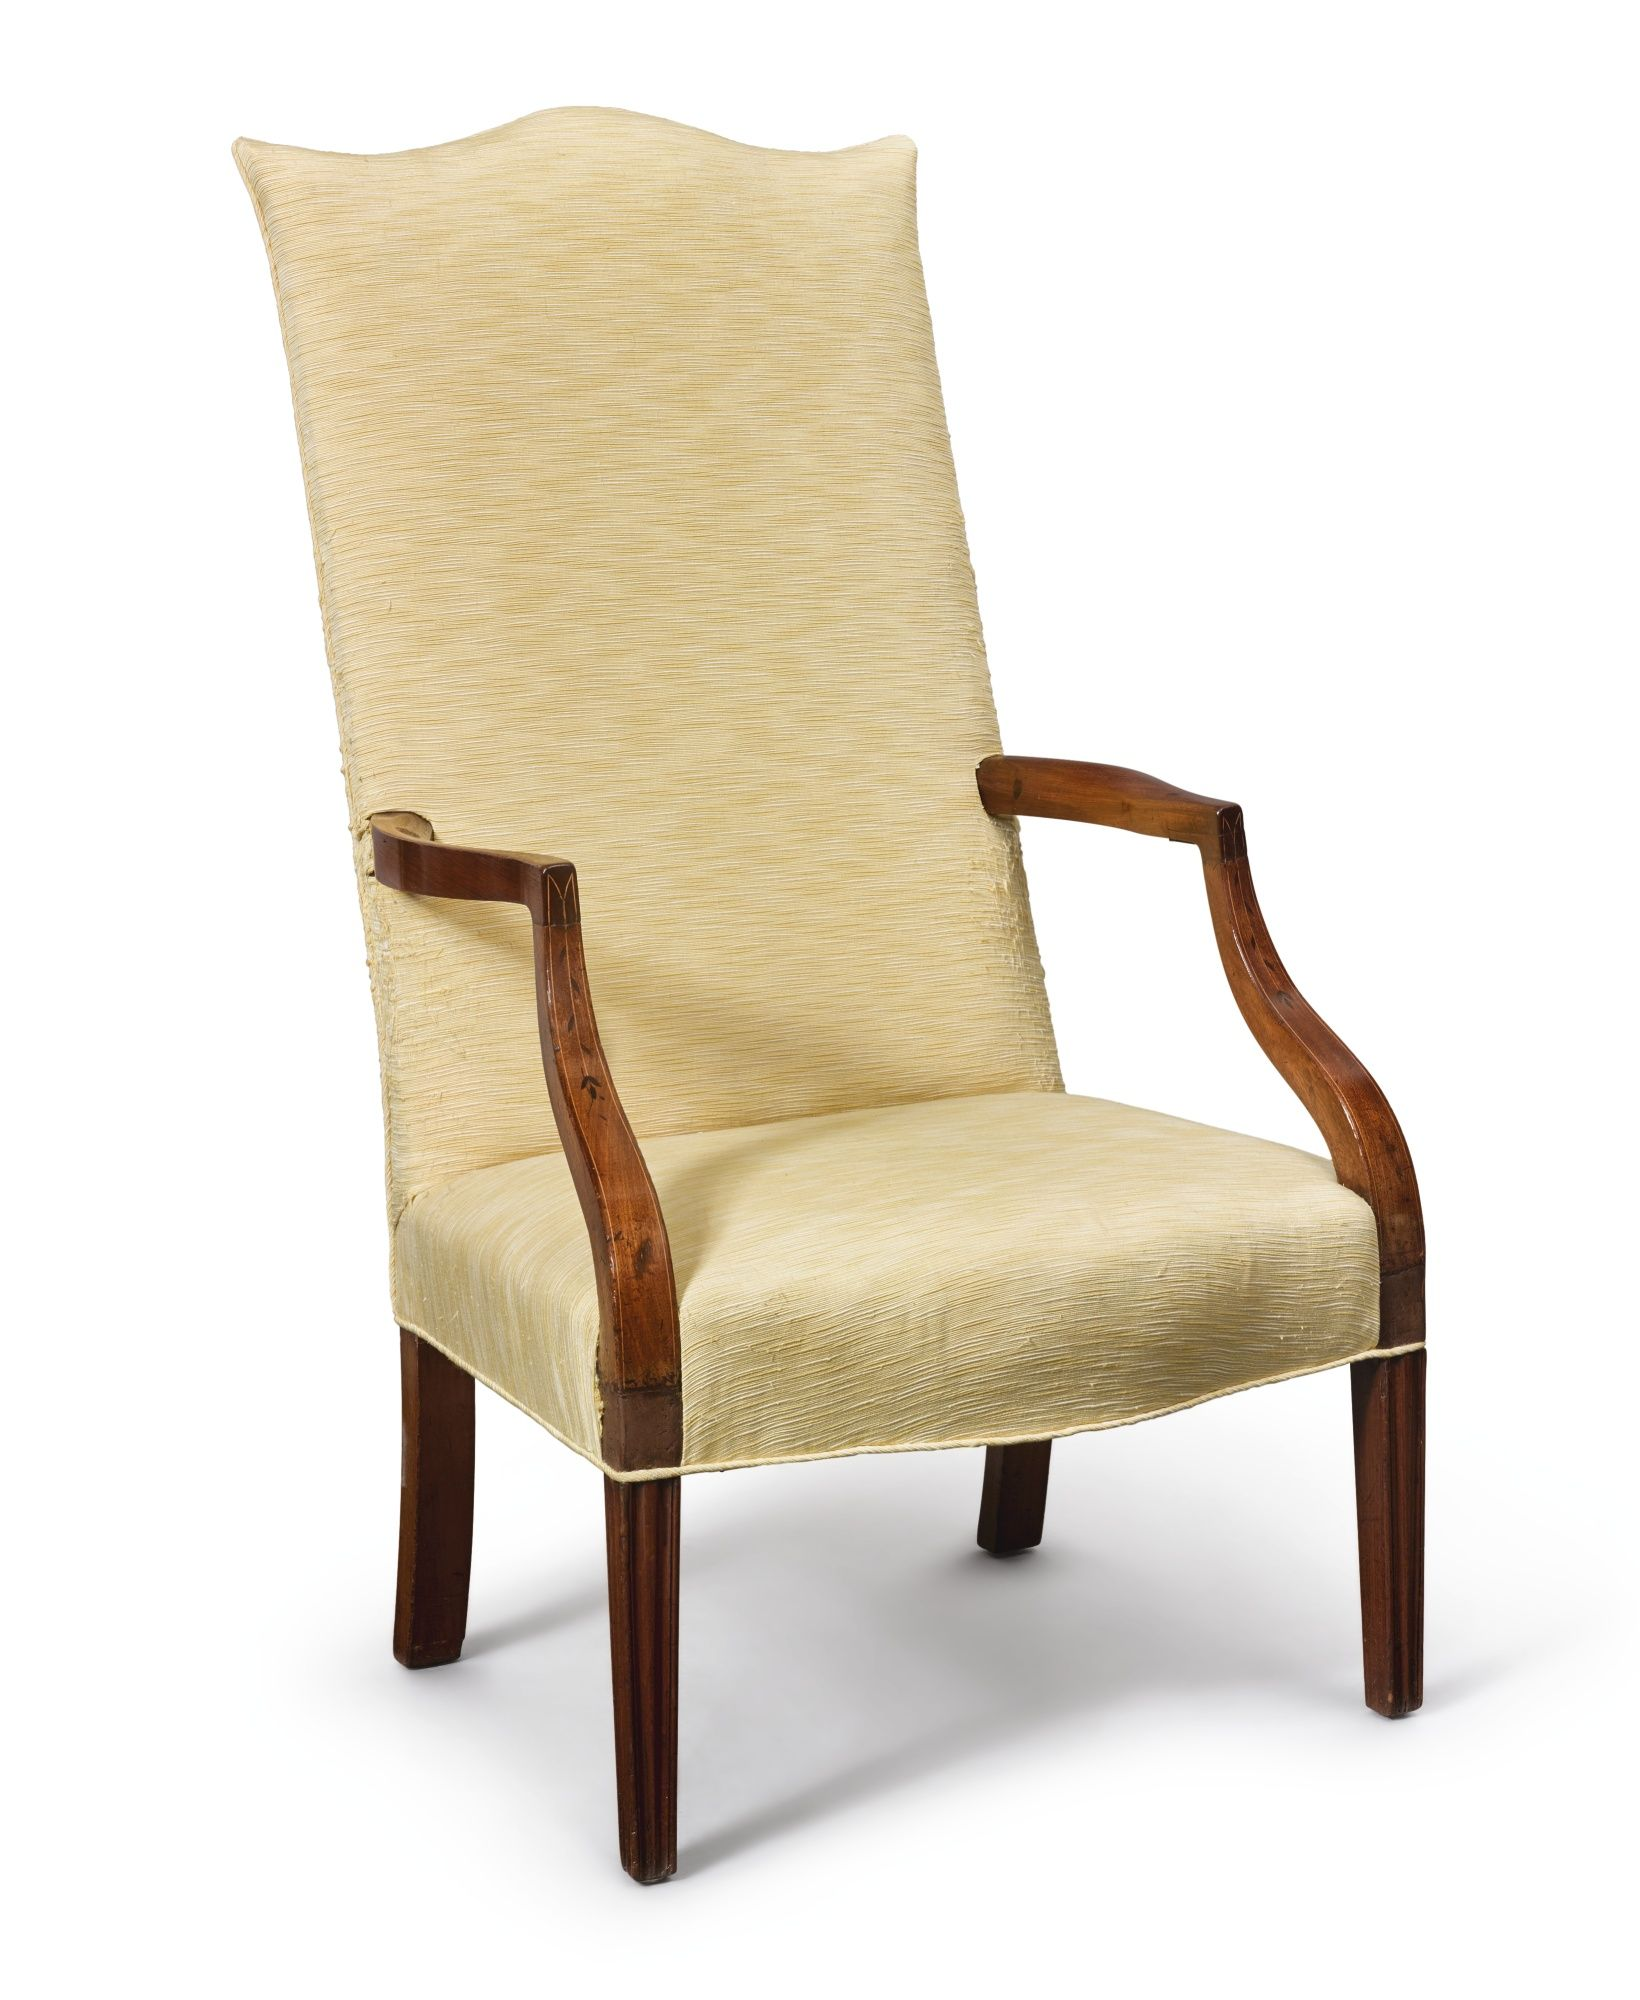 C1805 Federal Lolling Chair, MA, Mah, 46t, 17 2,8